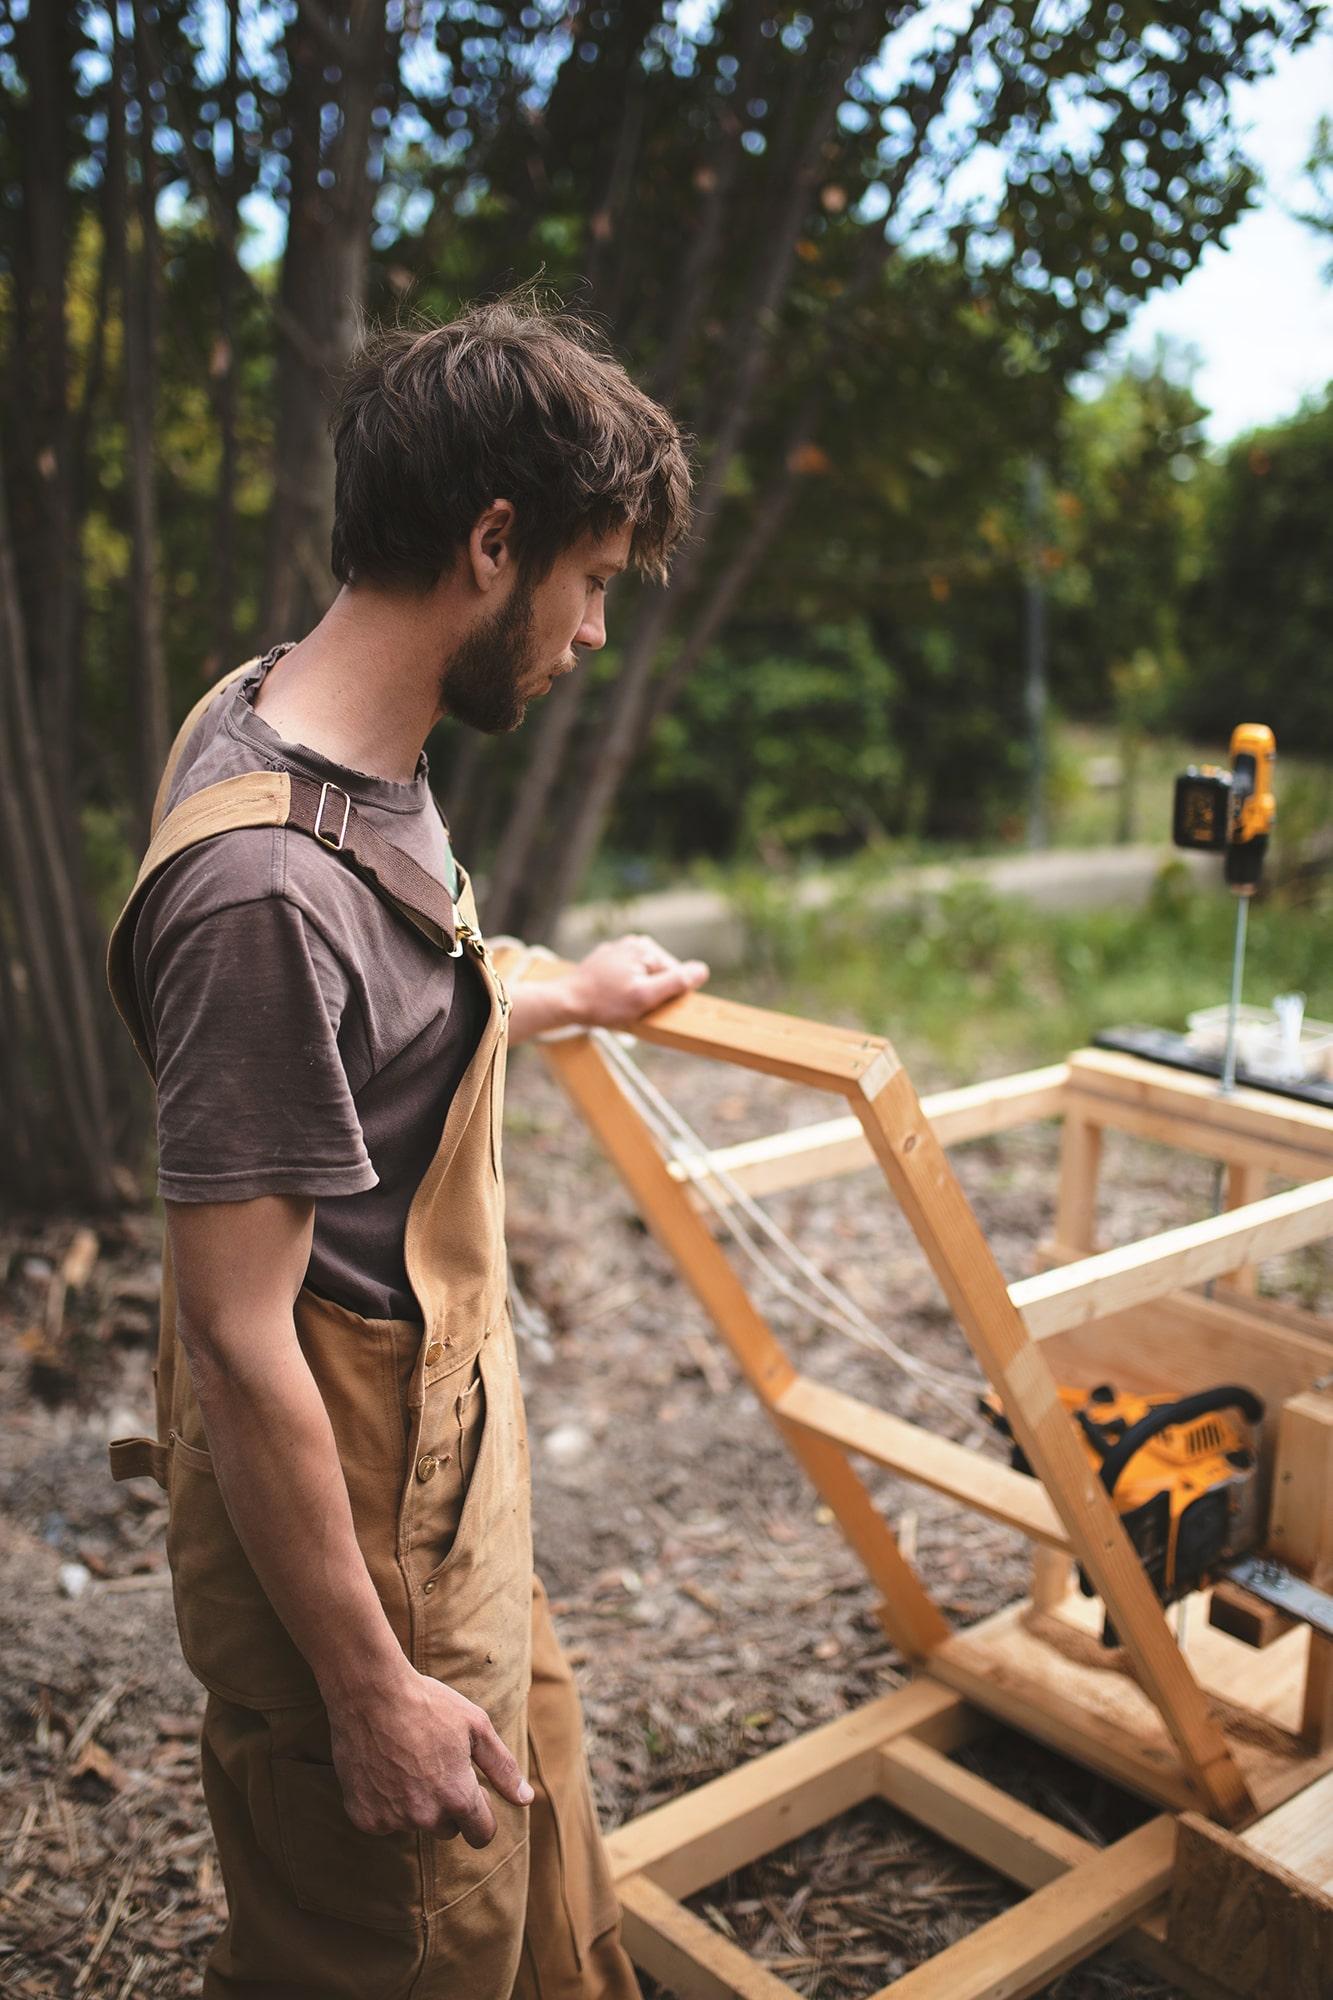 máquina cortar madera